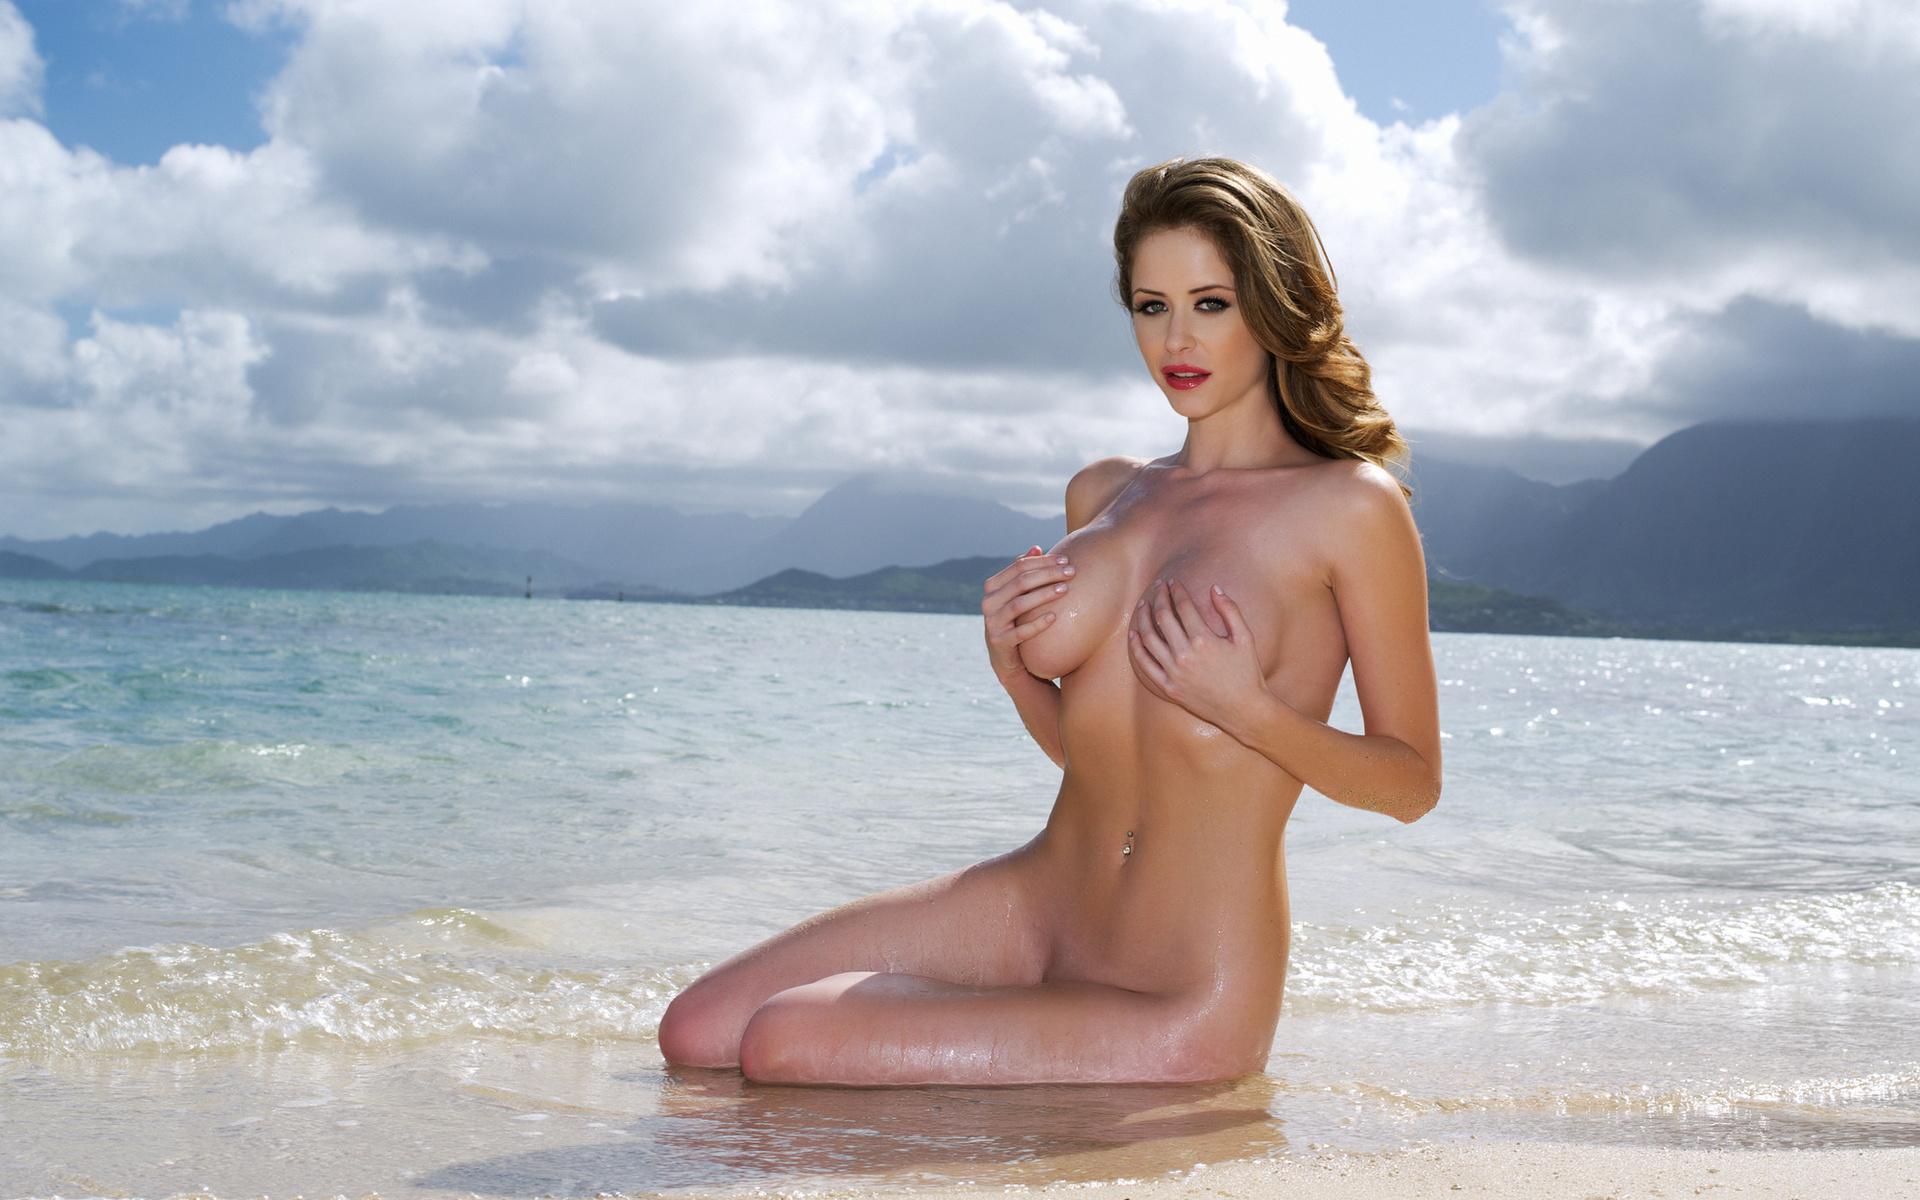 фото голой девчонки с сиськами в море - 12